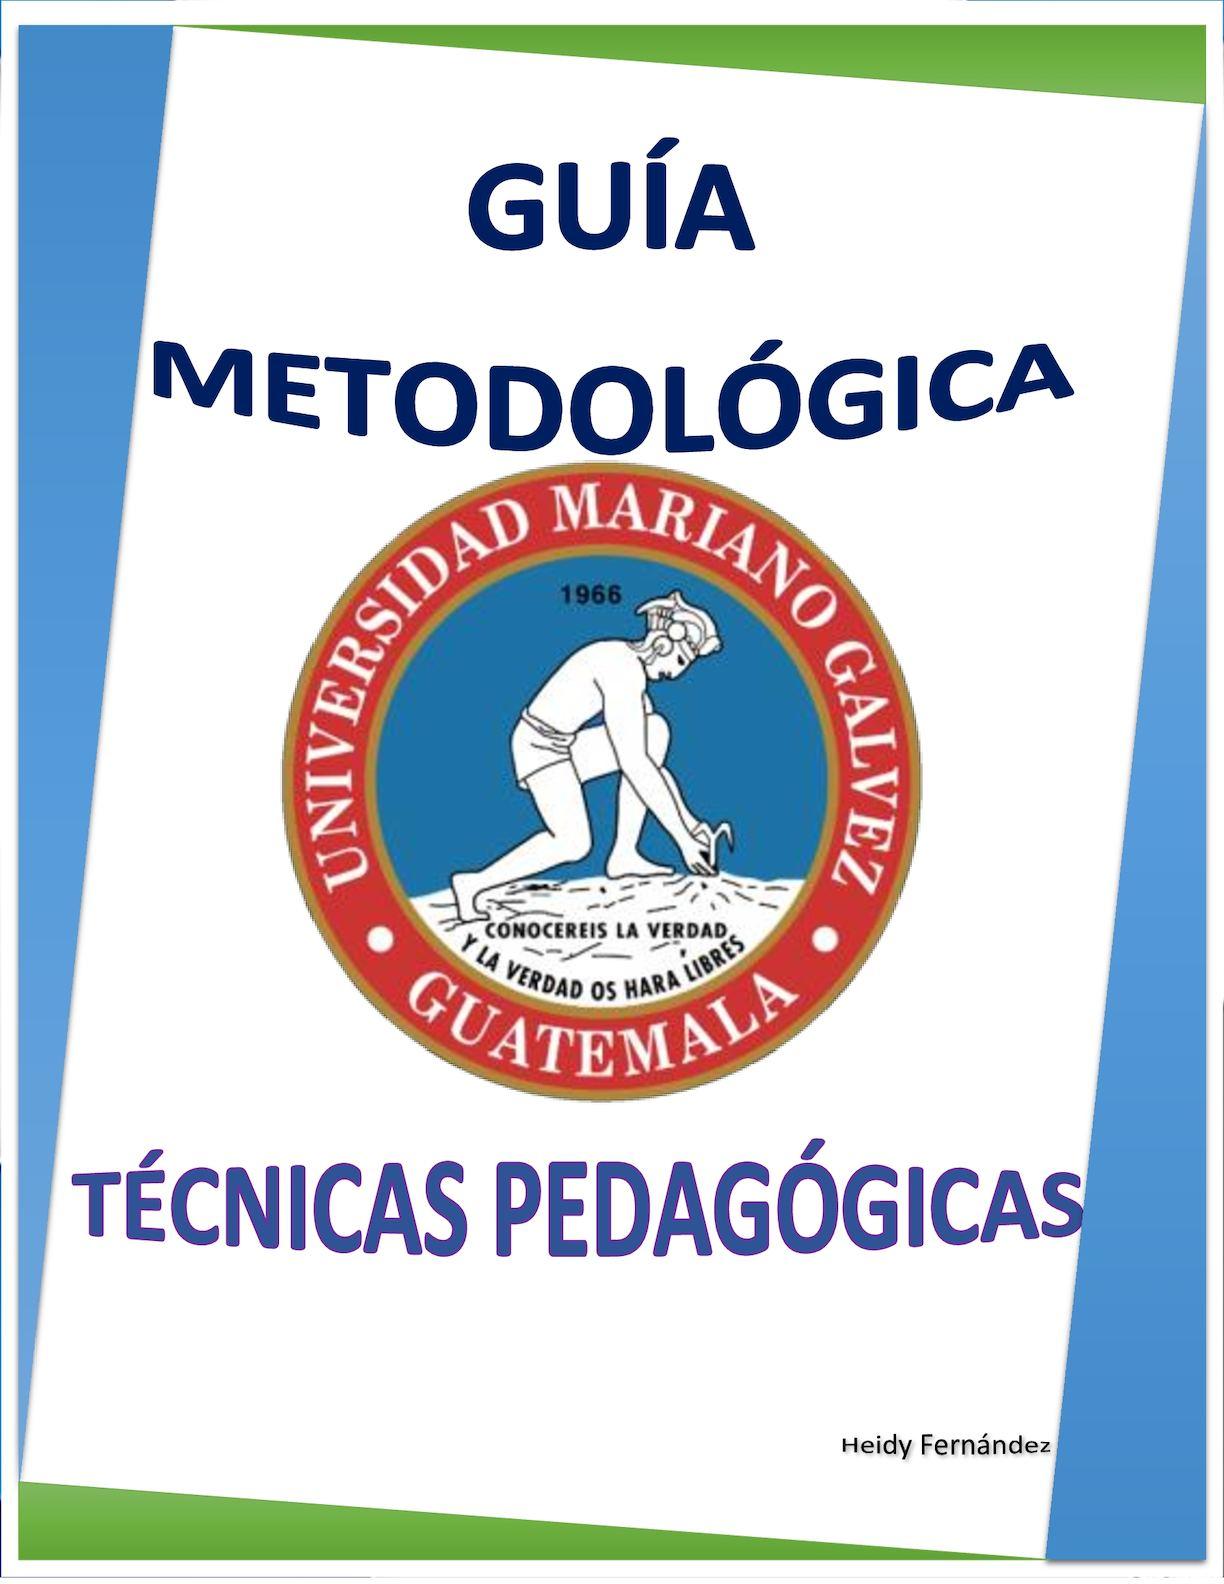 Guia Metodologica